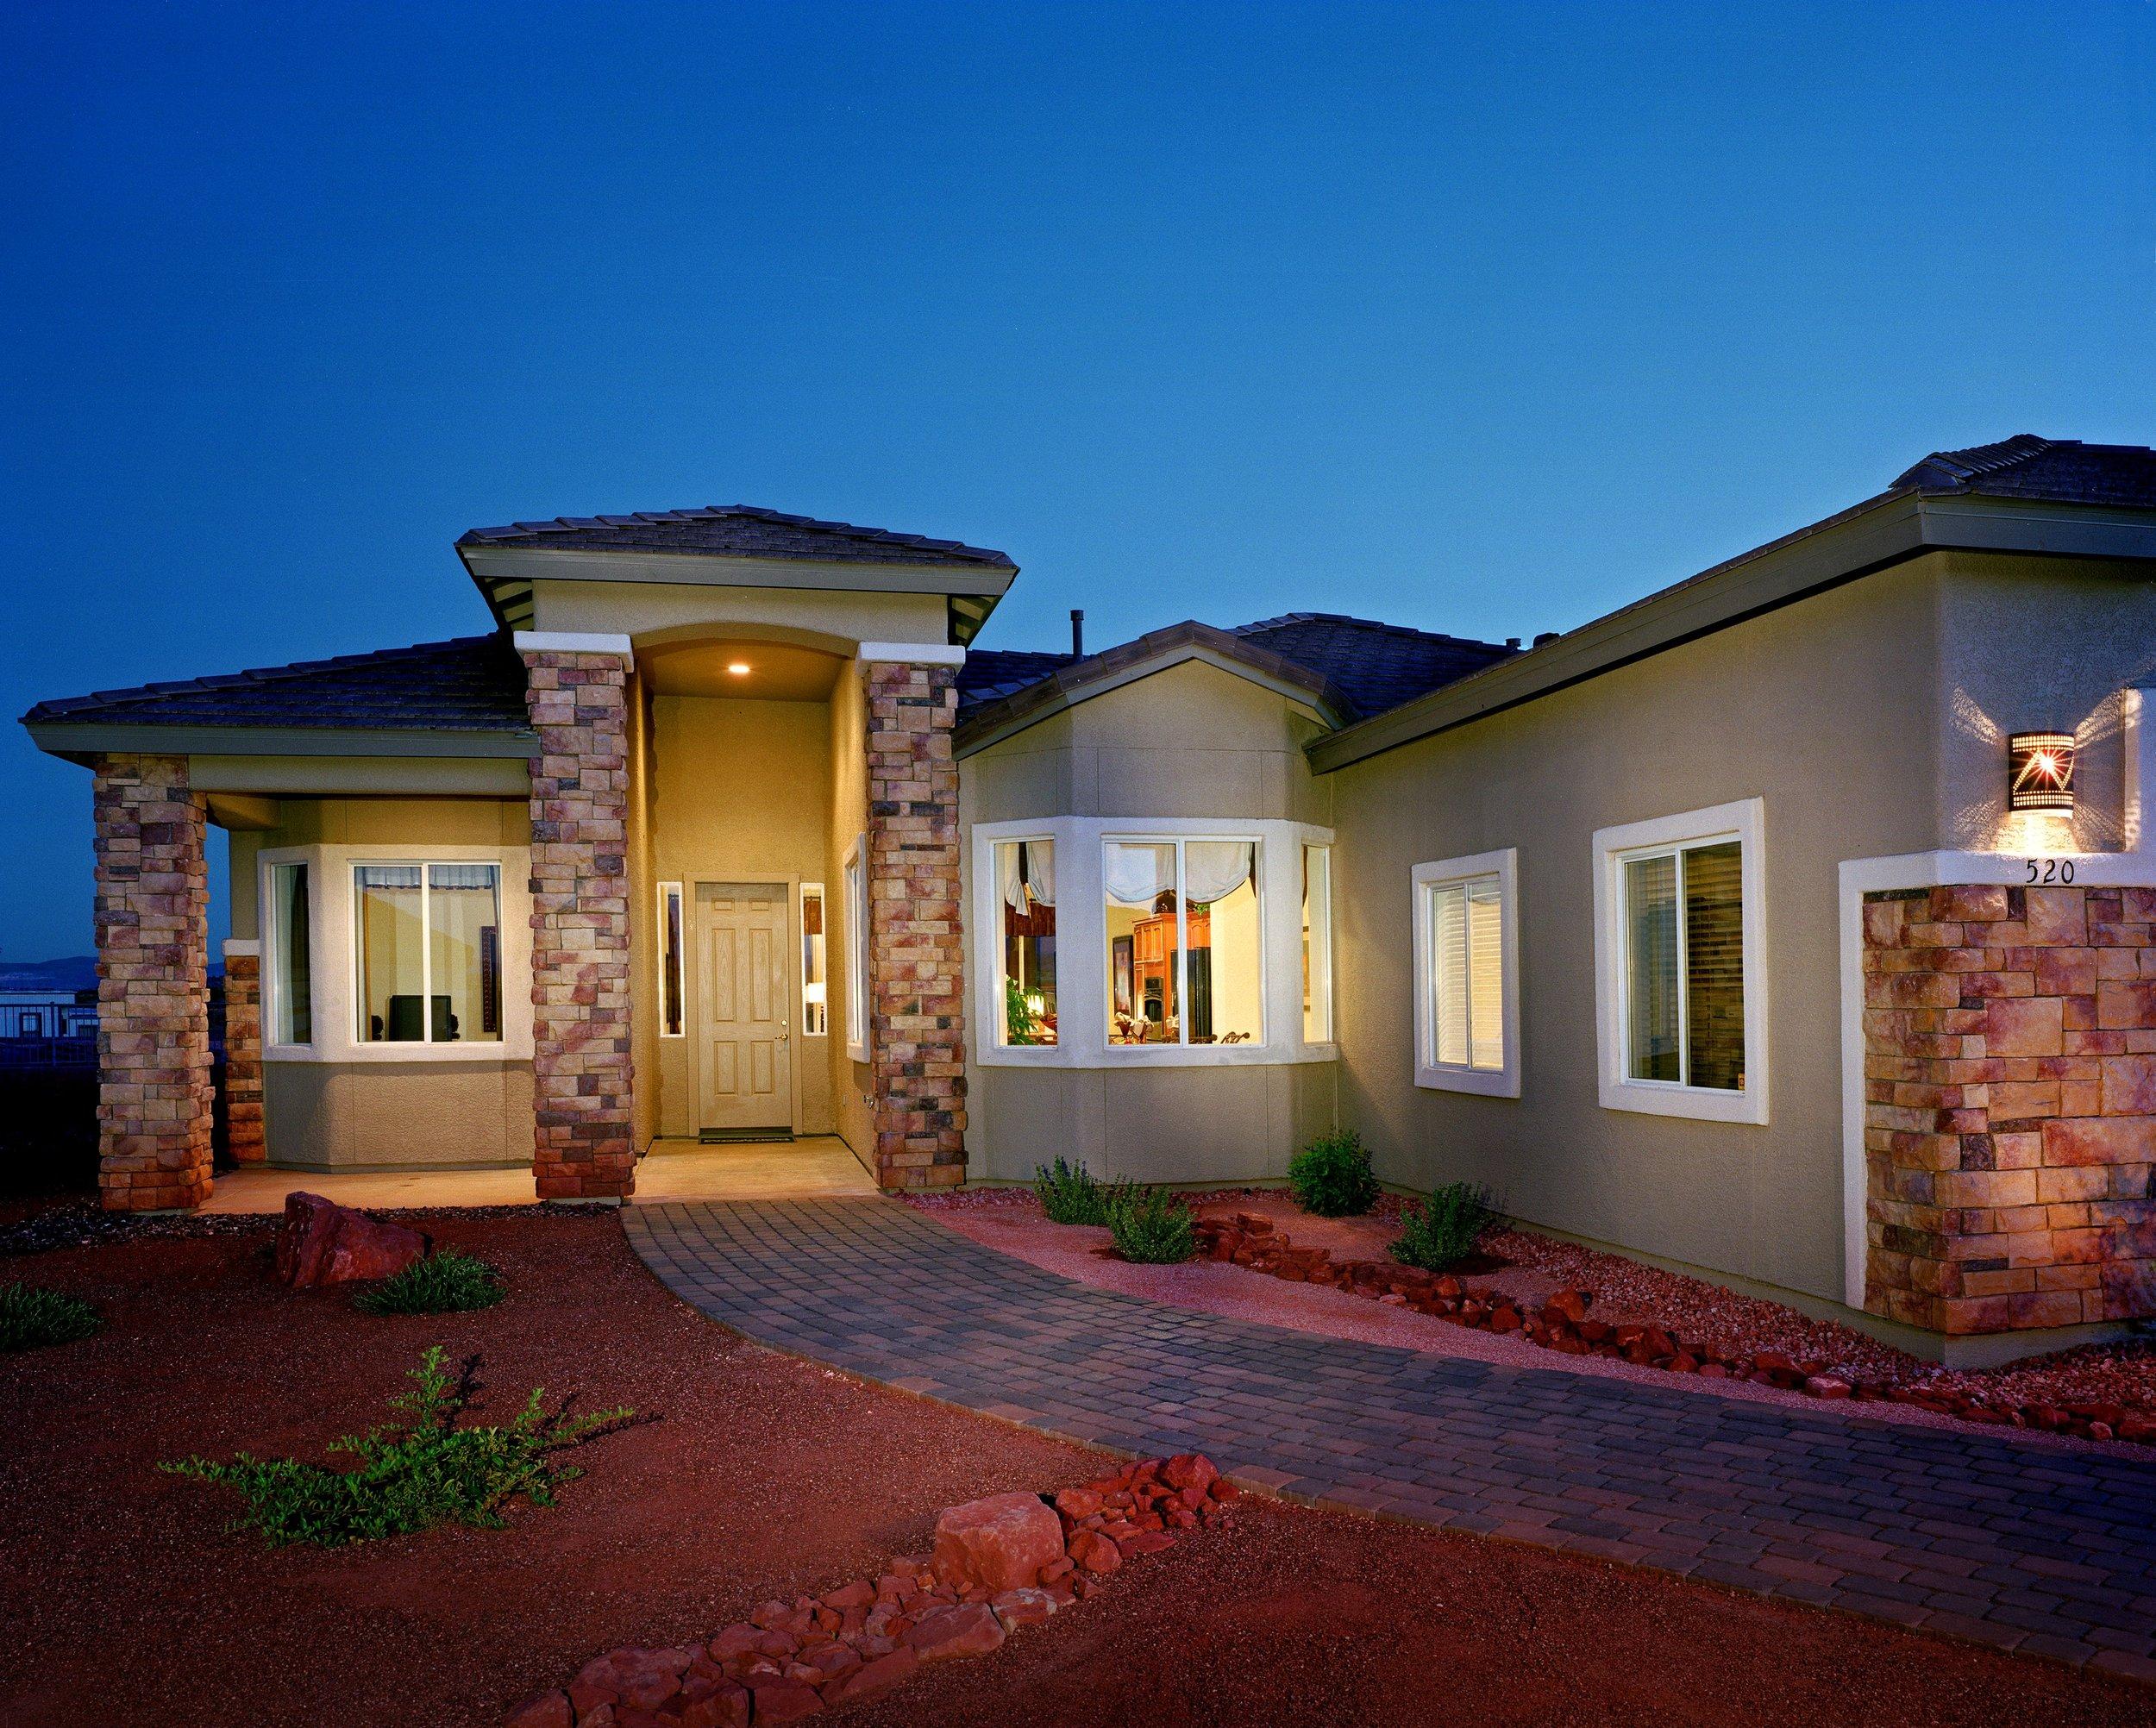 Home-Exterior-Verde-Santa-Fe.jpg